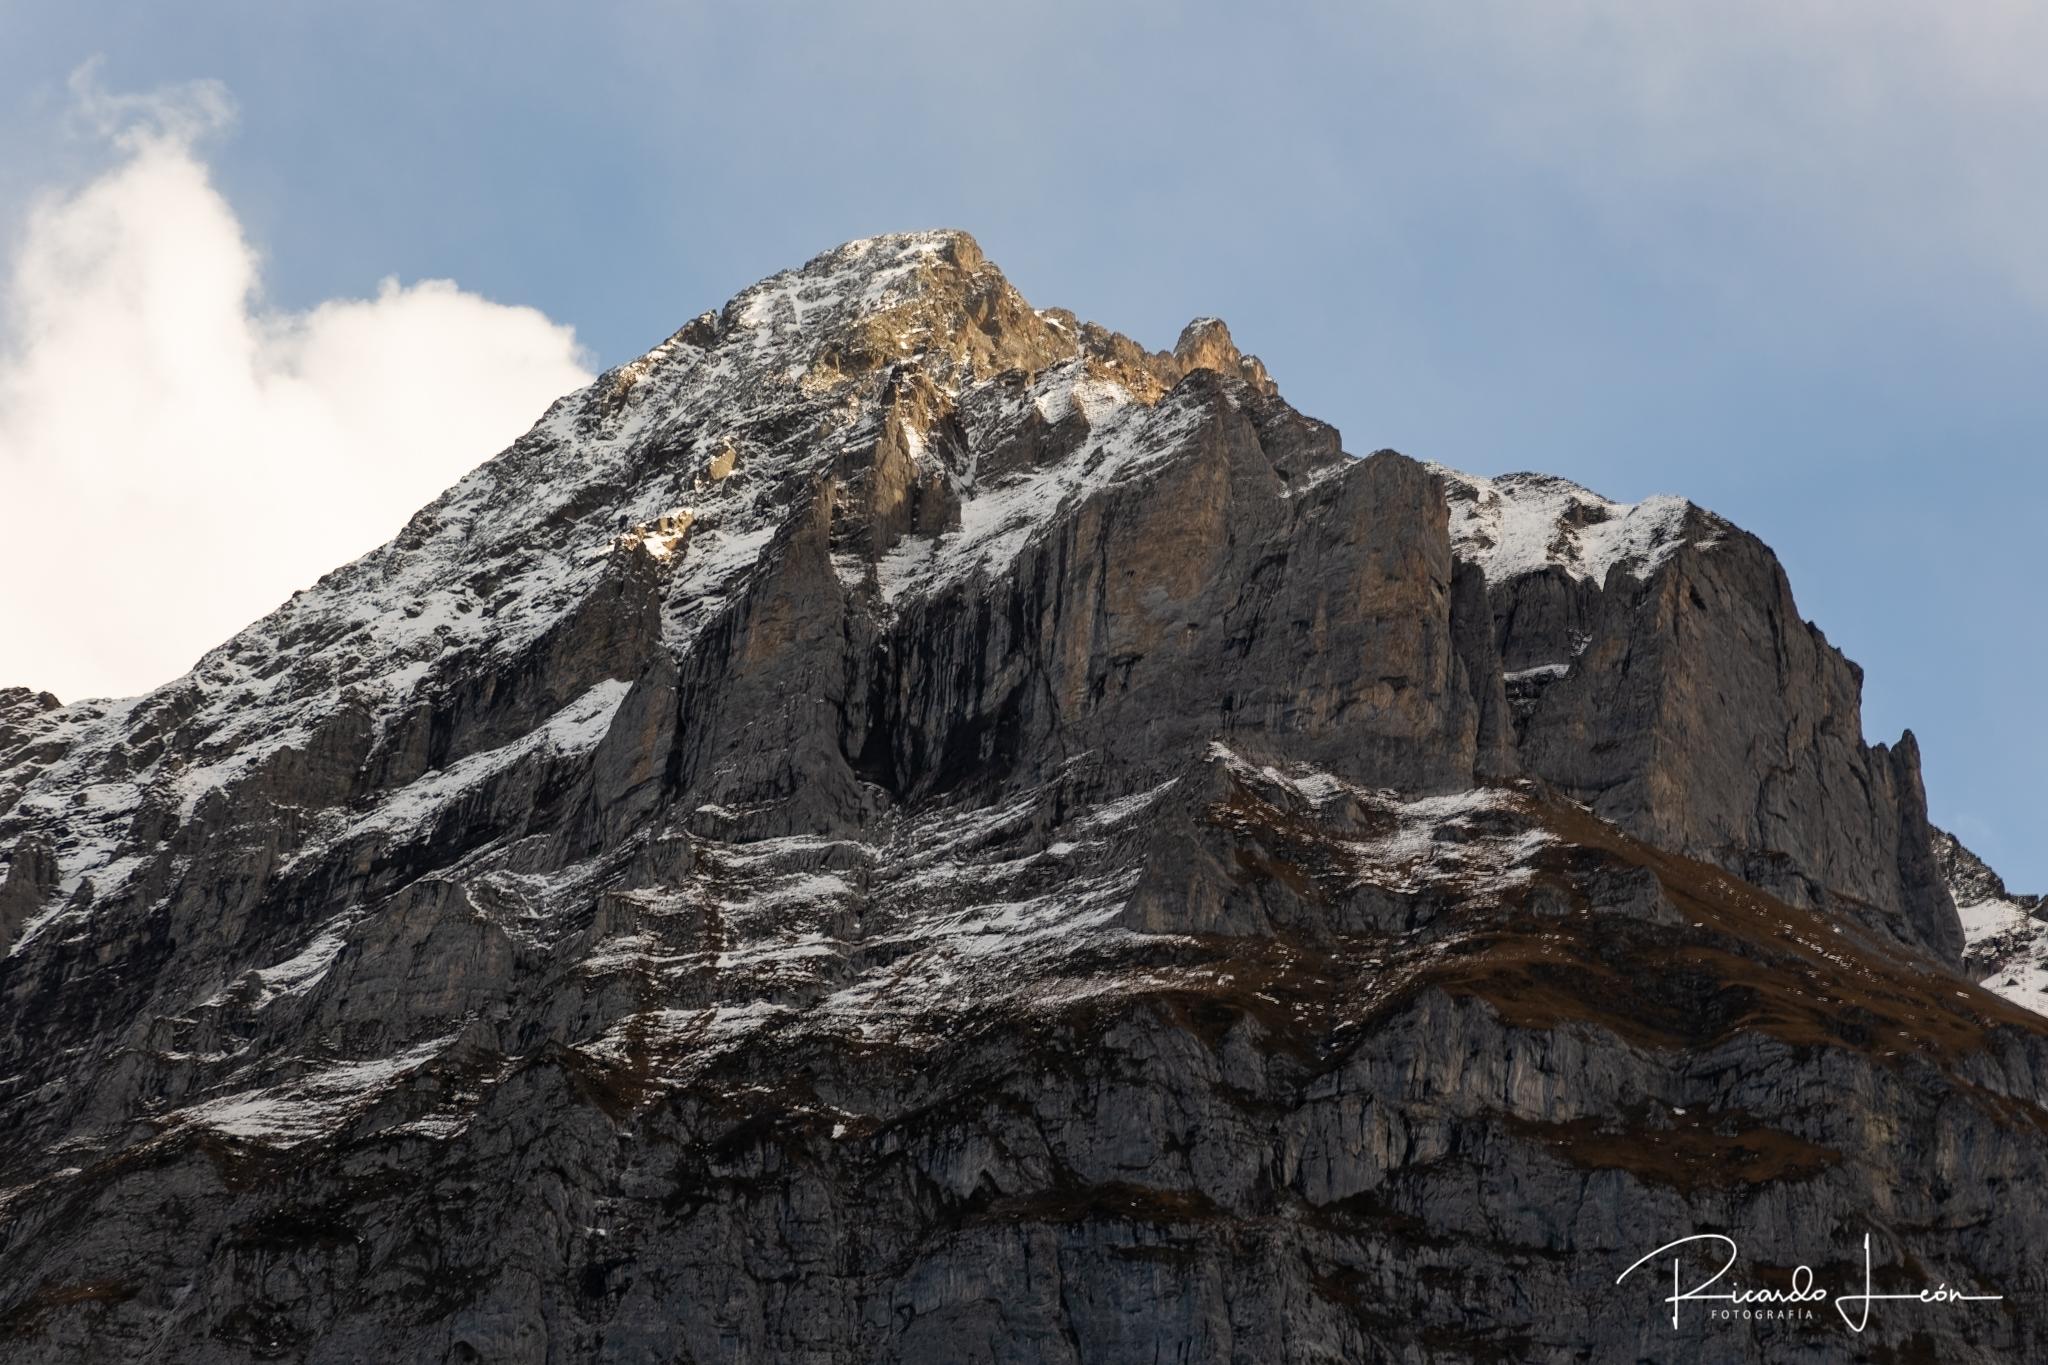 WIX_Viaje a Jungfraujoch_MG_6023